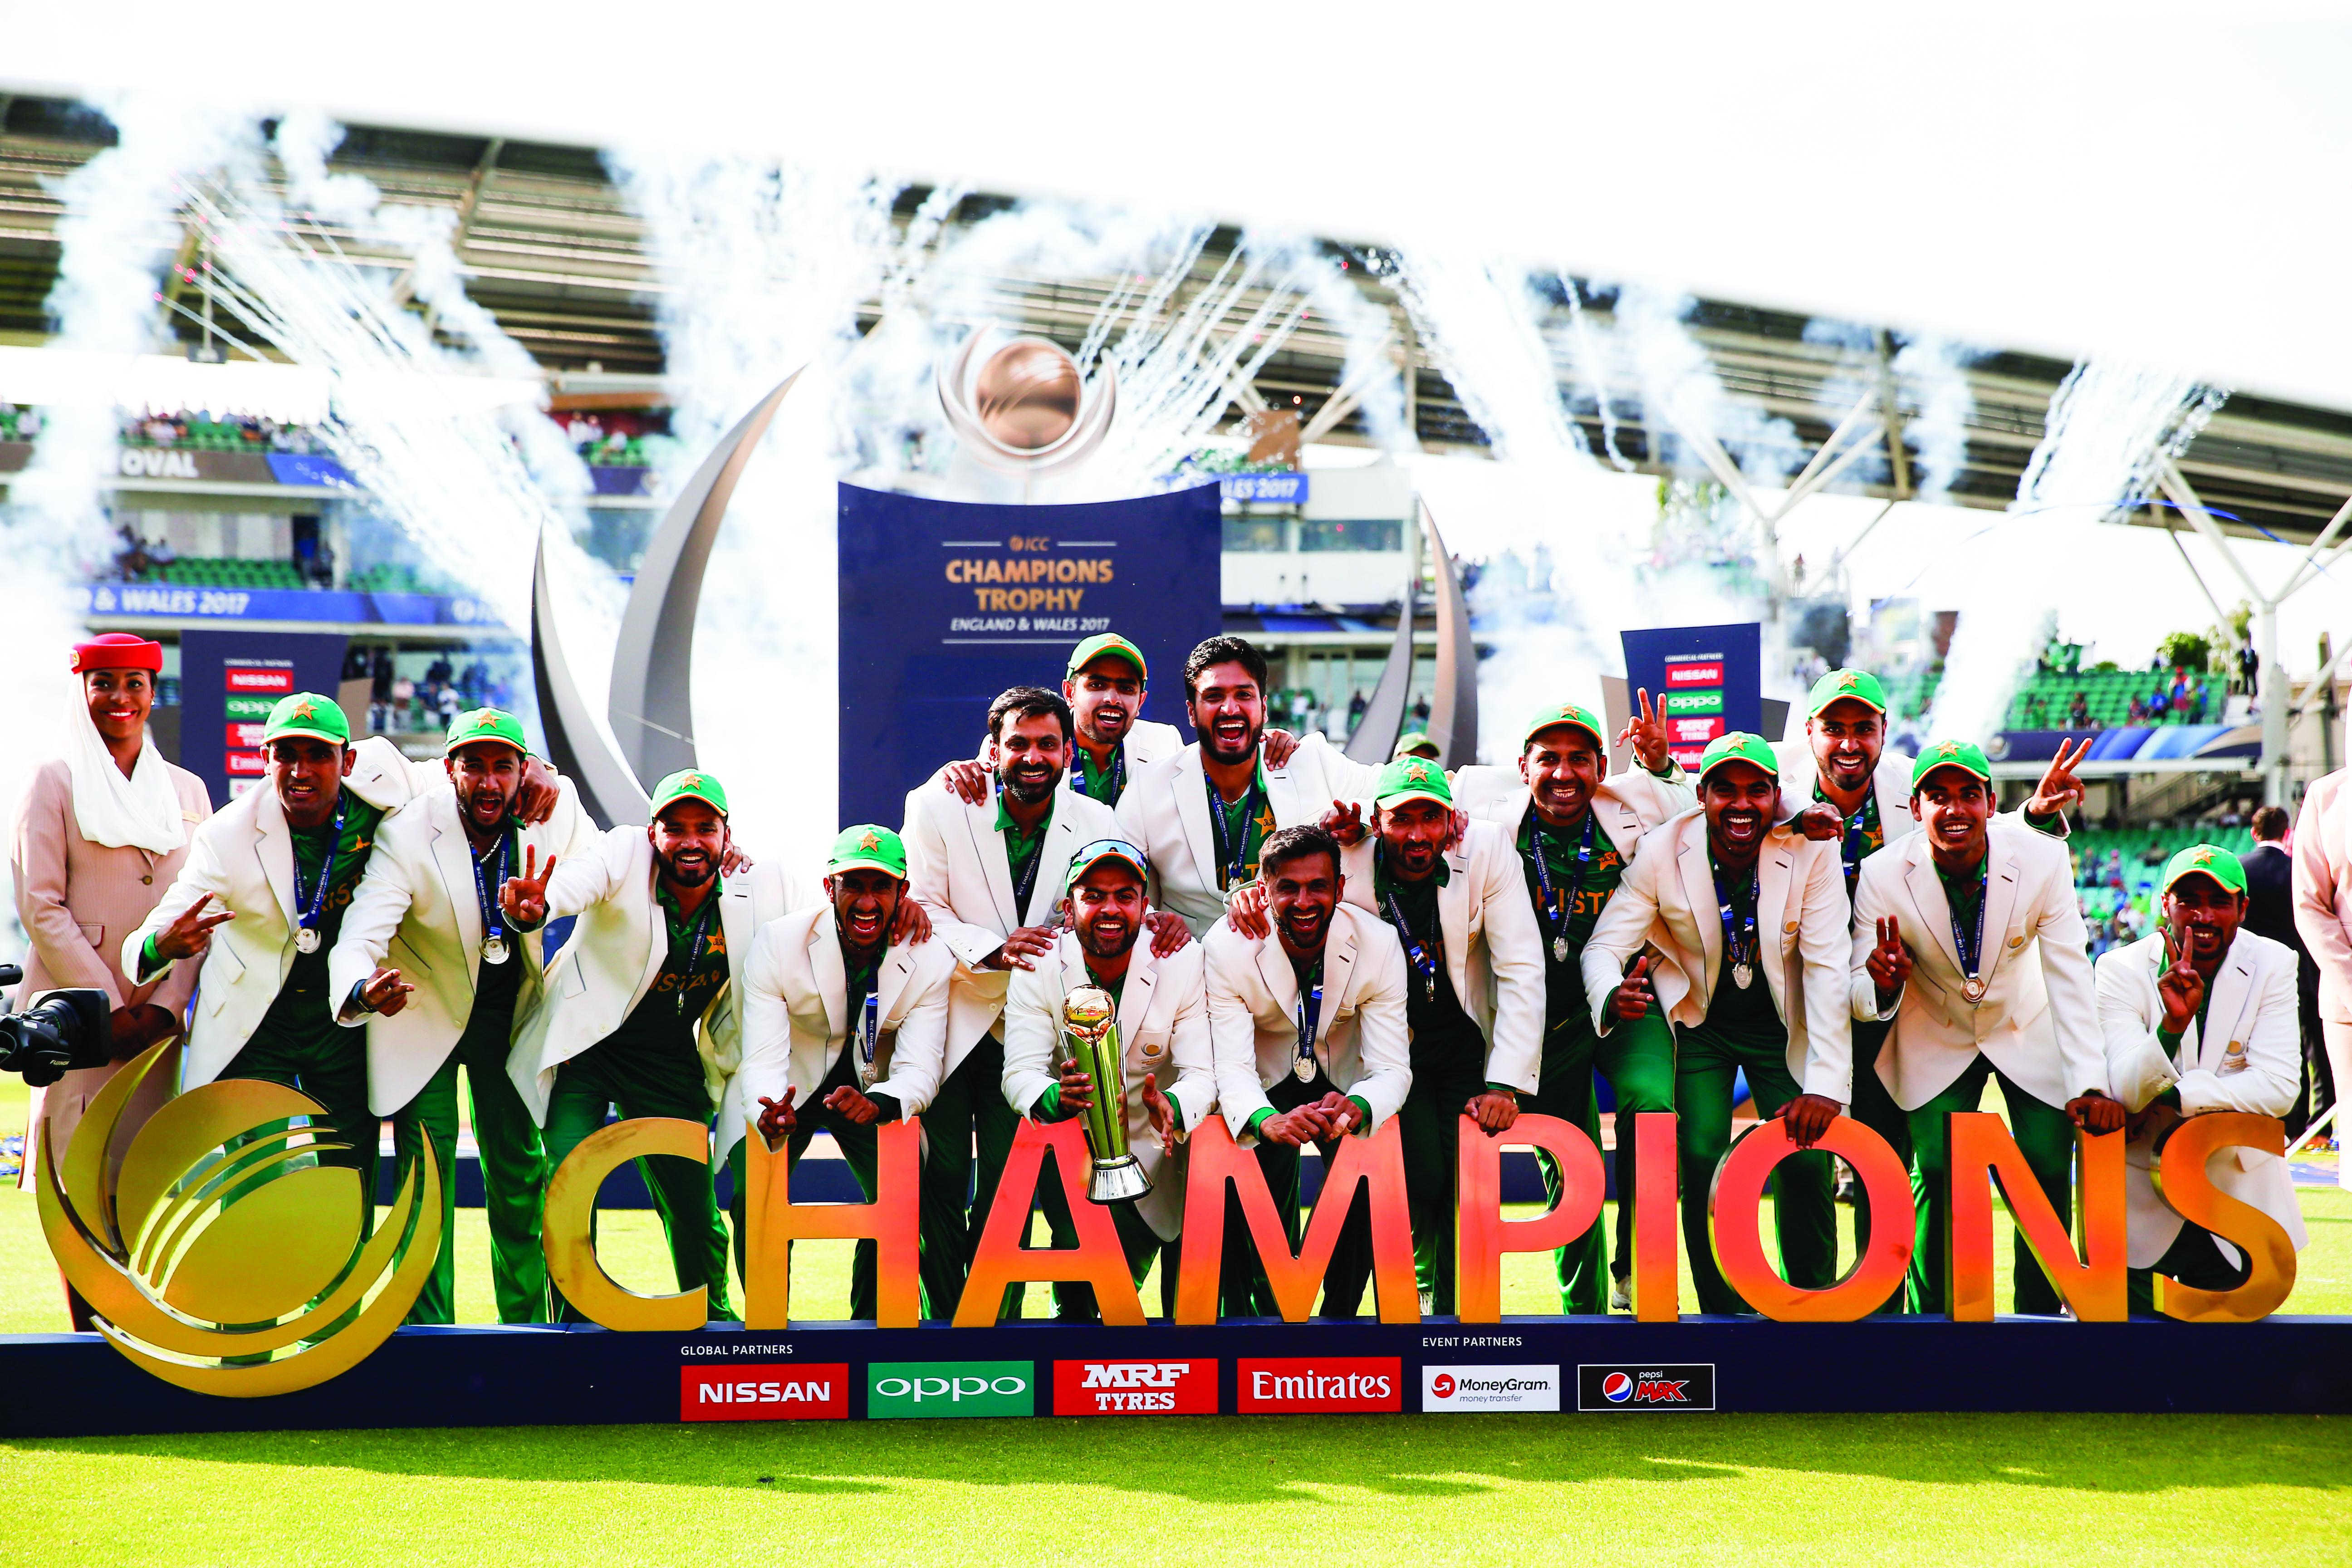 Cricket: Fakhar, Amir script India's downfall as Pakistan lift Champions Trophy